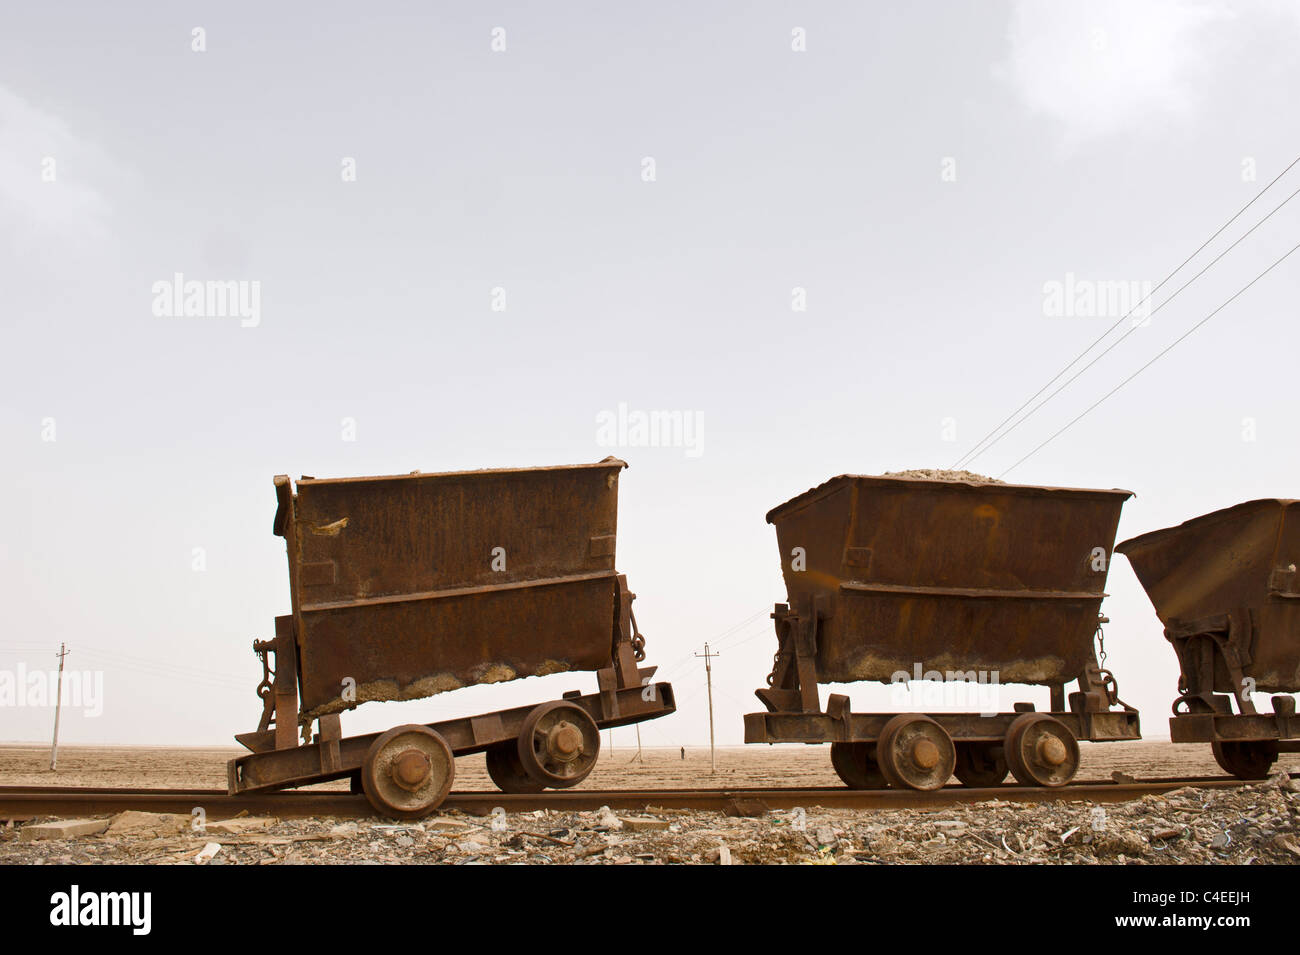 Hoppers on rail track at Chaka Salt Lake, Qinghai, China. - Stock Image